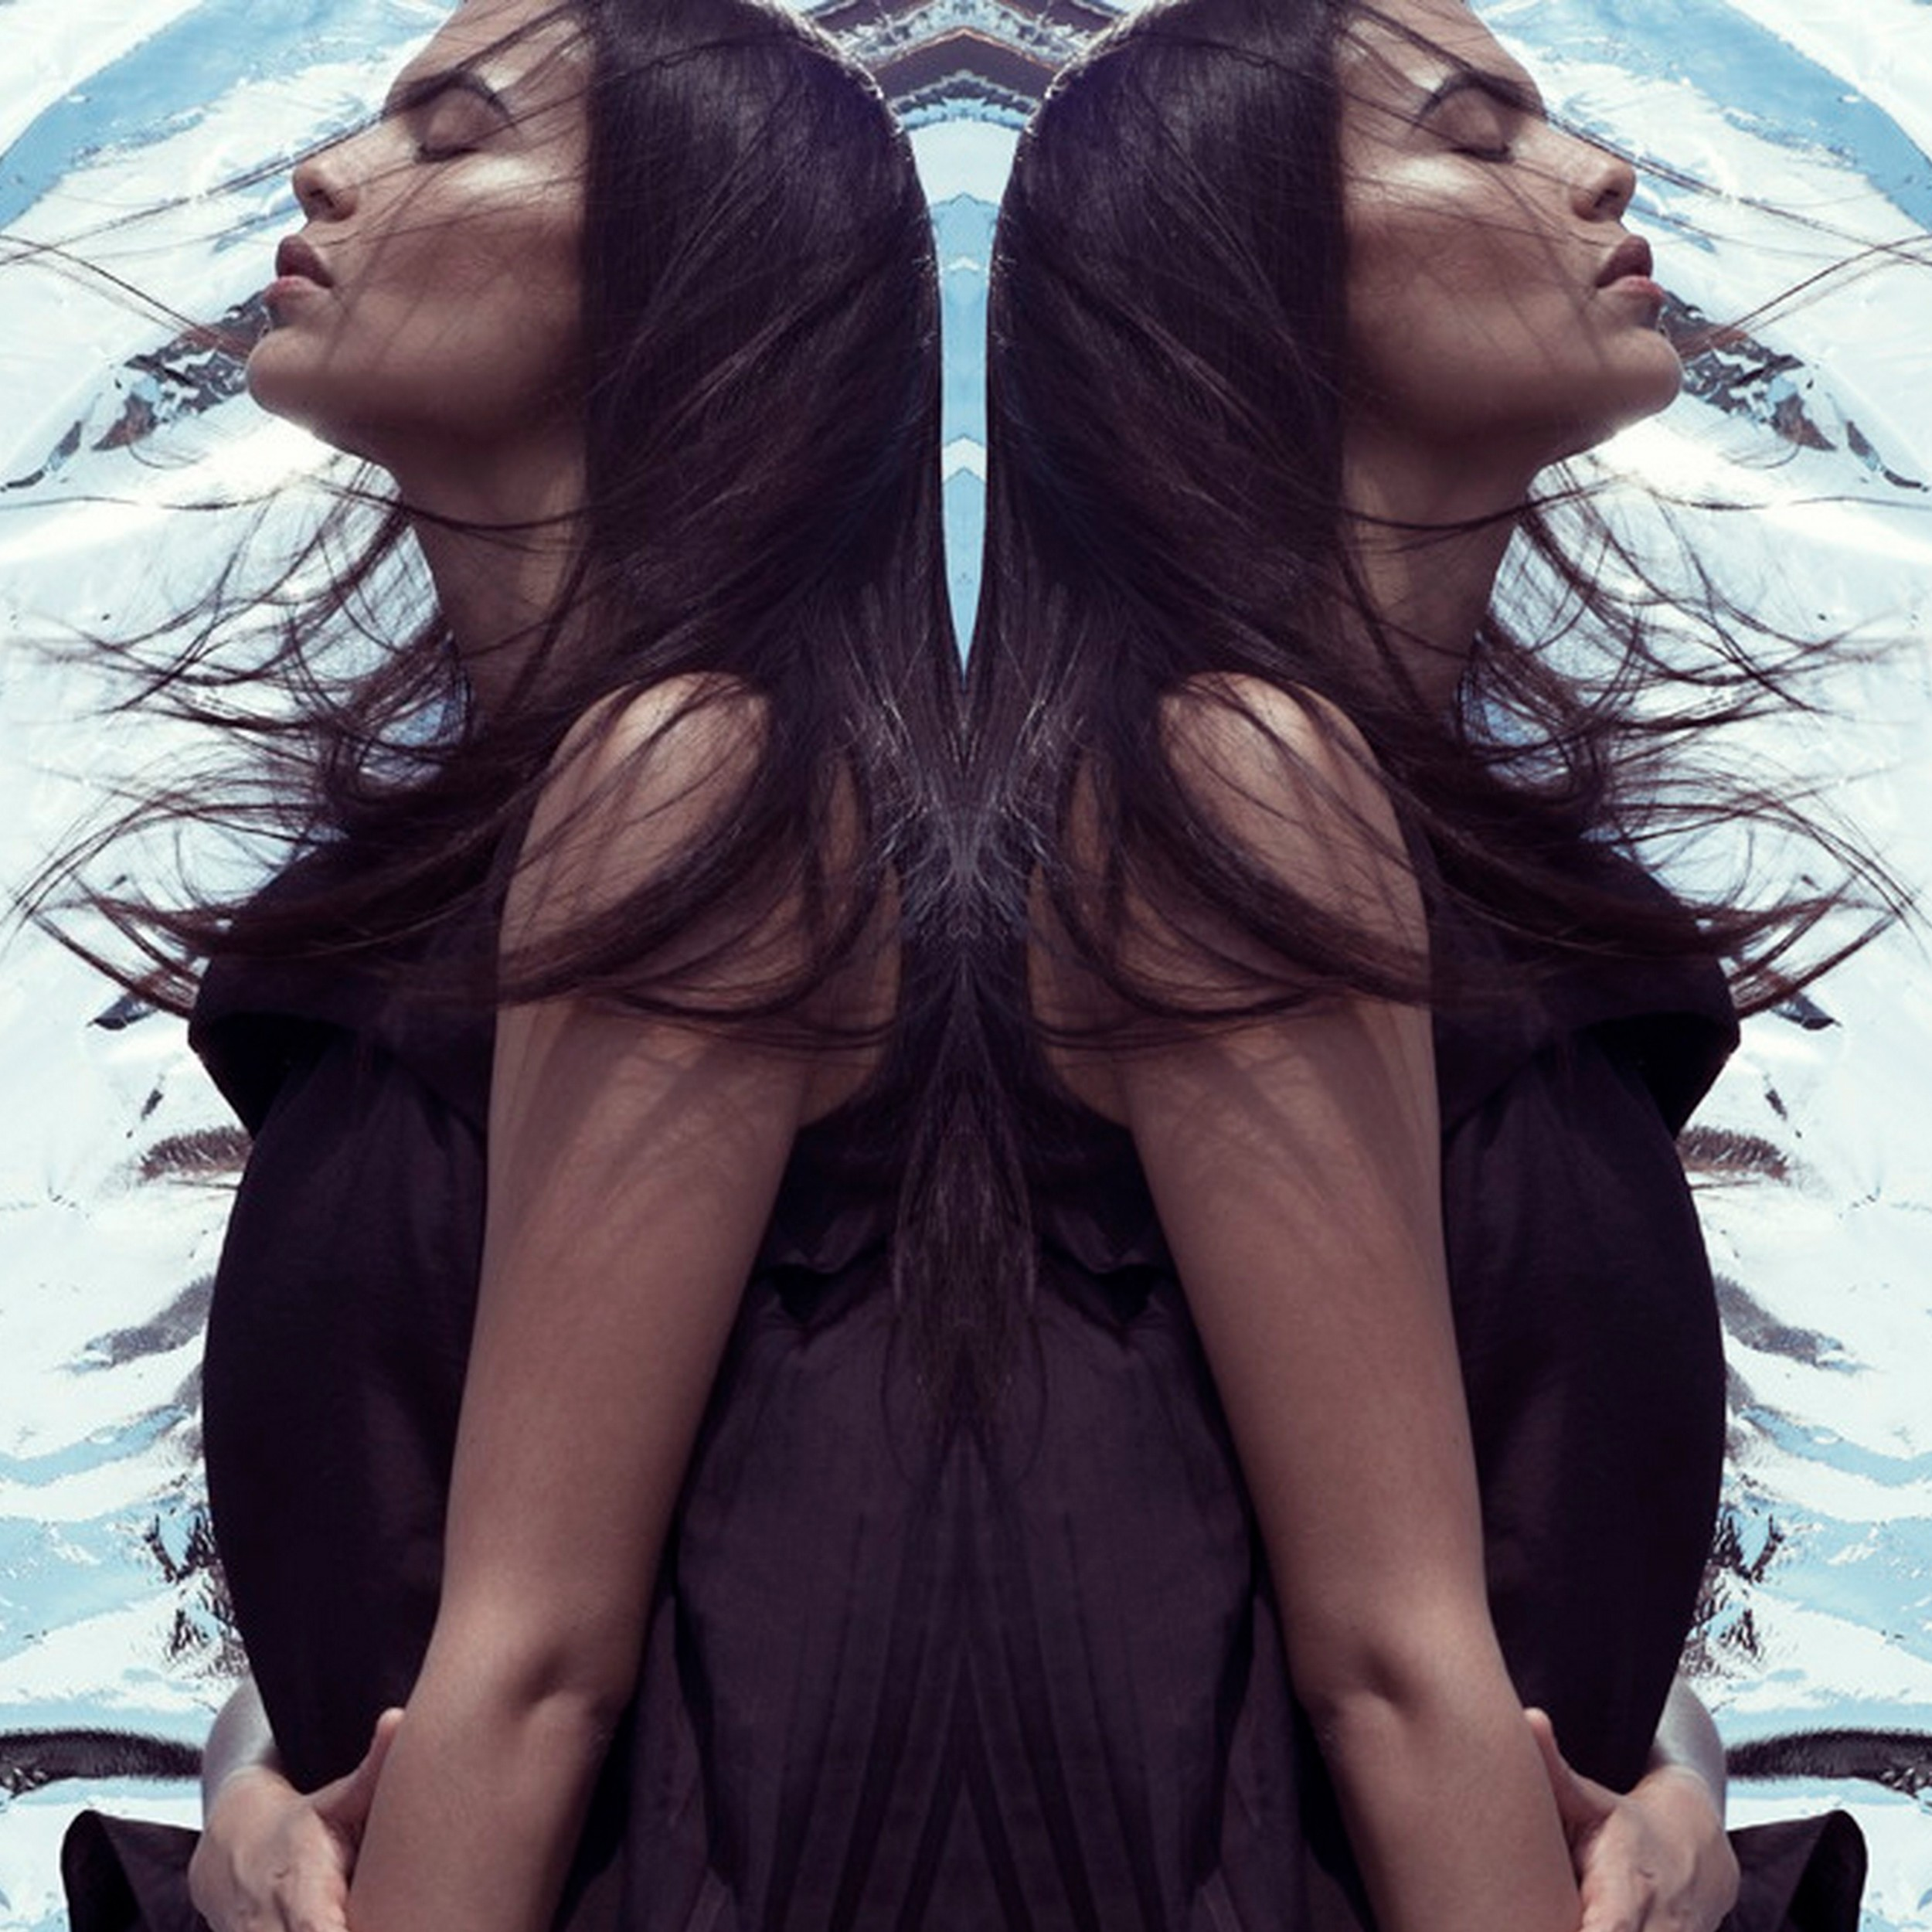 Original image of Jade Willoughby via  Anima